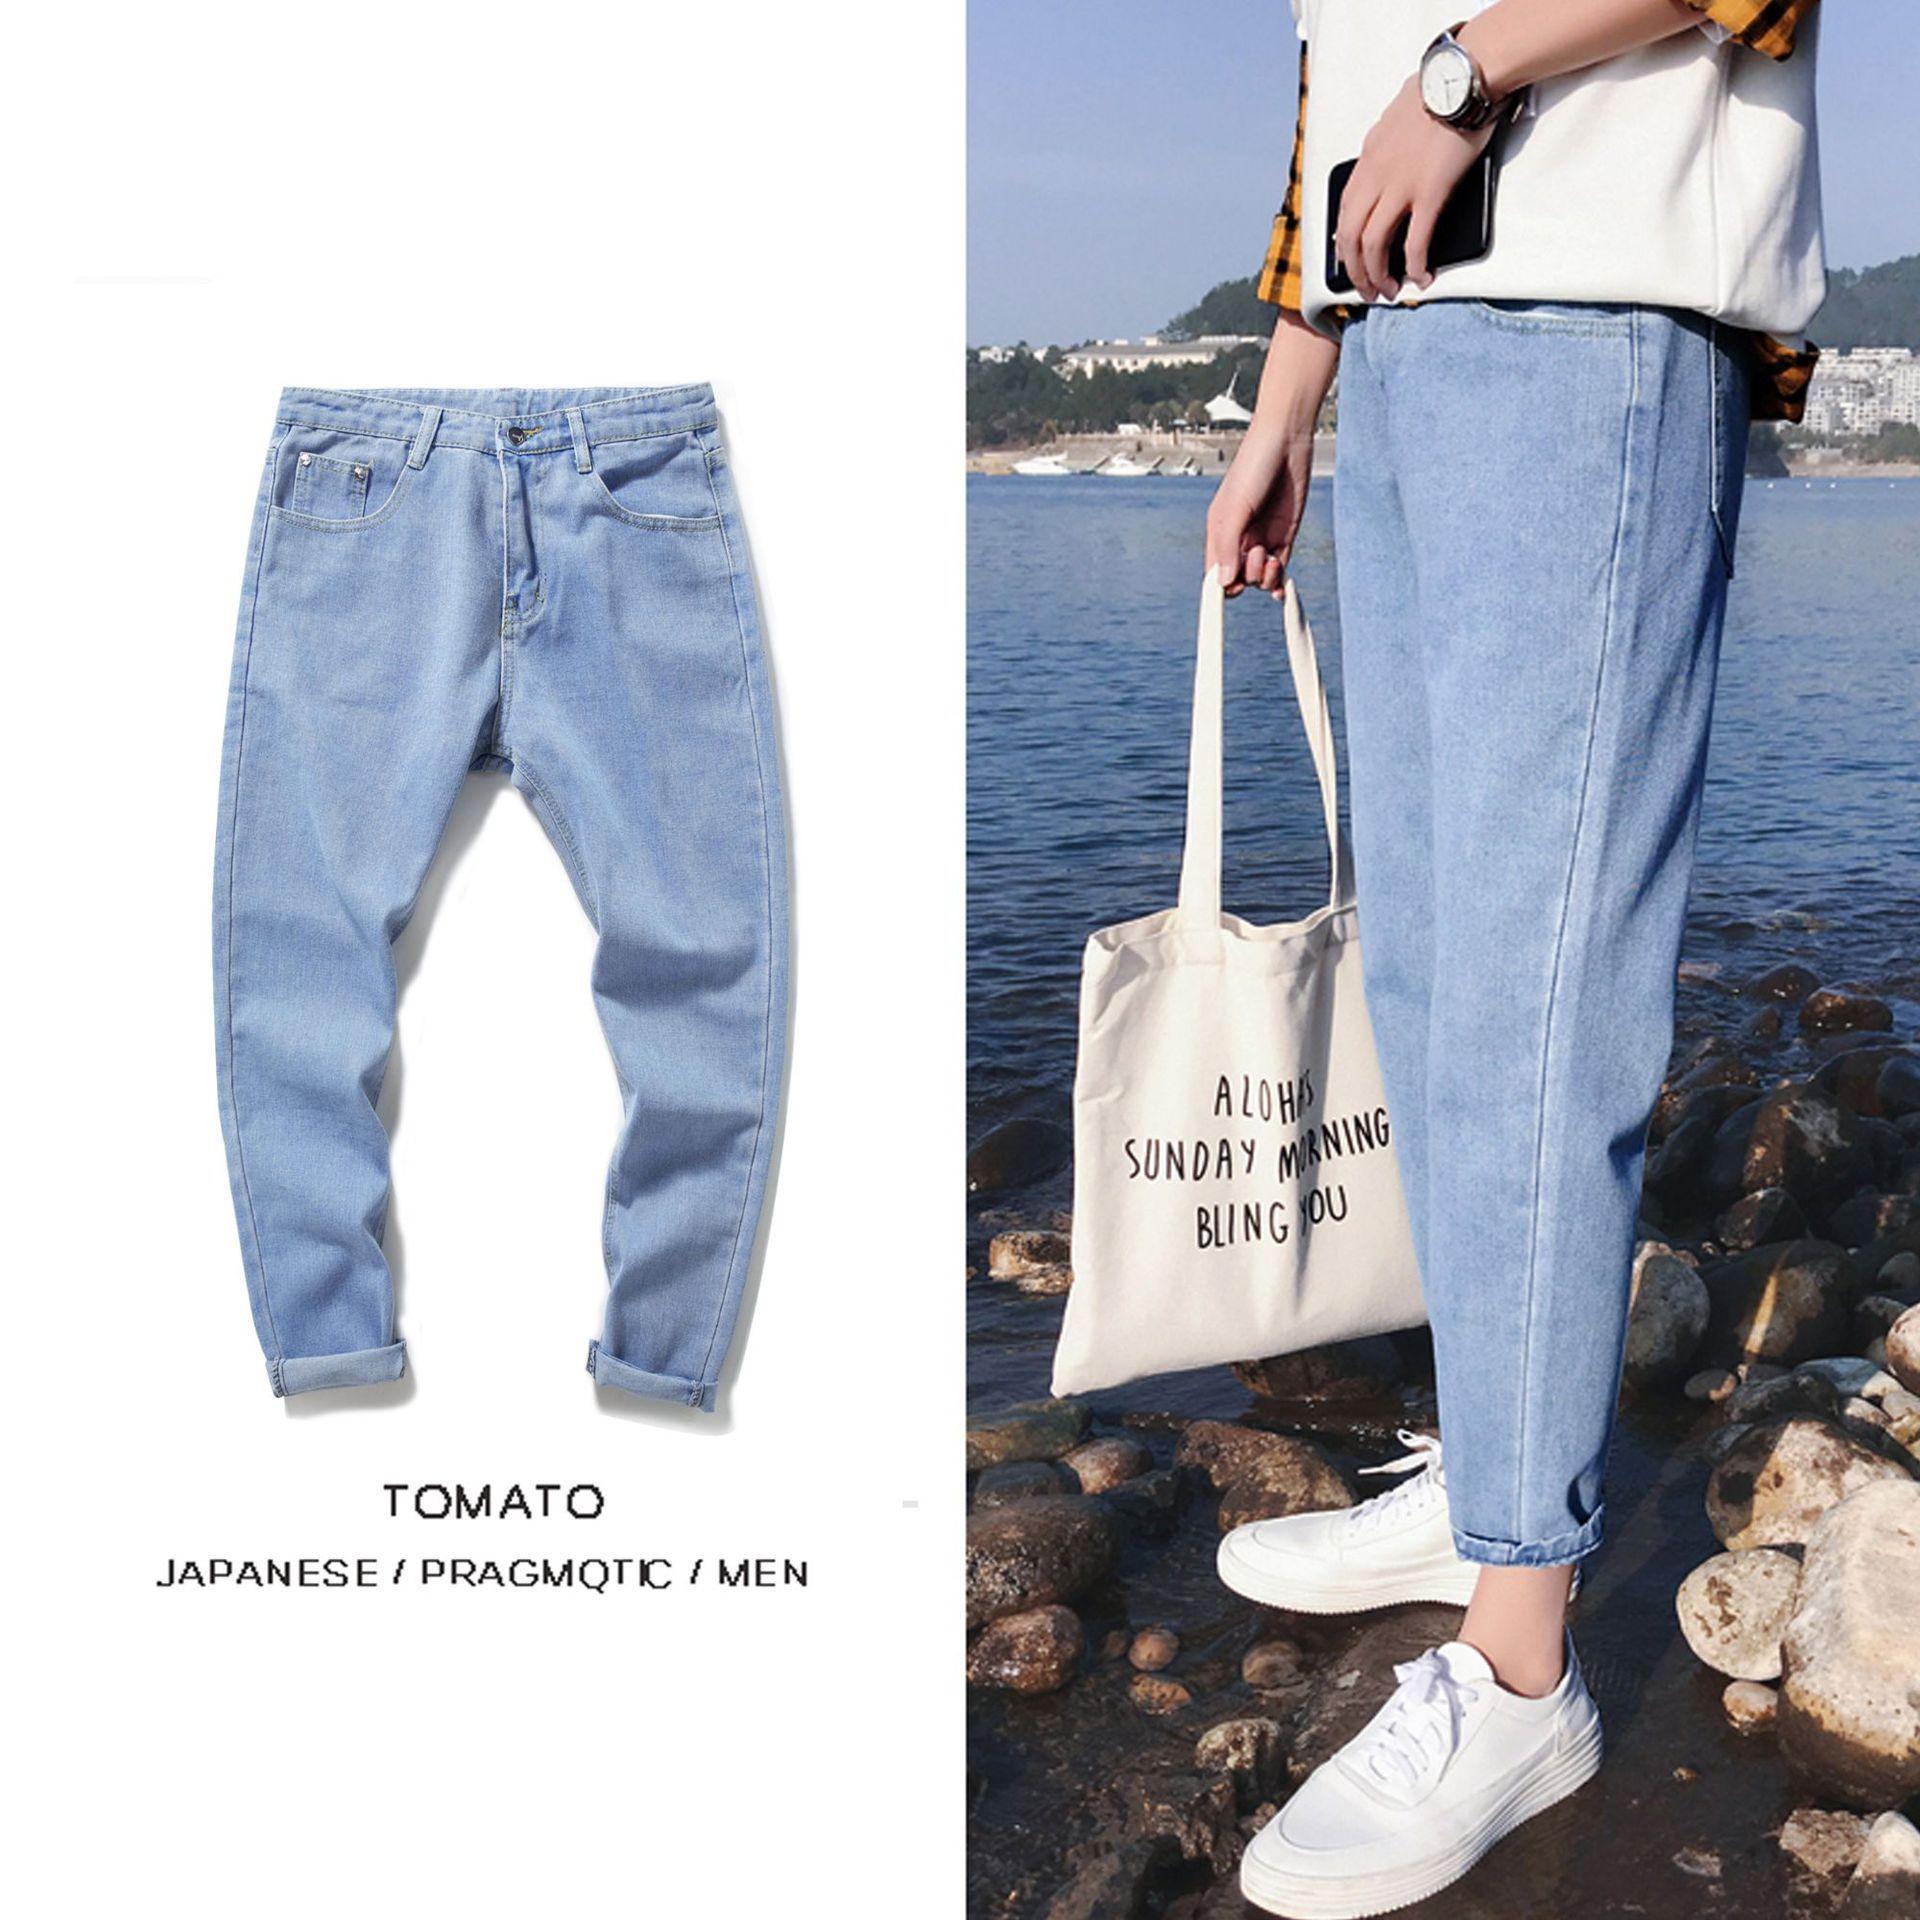 New Style Capri Pants Men's Light Color Summer BF Style Straight-Cut Jeans Students Versatile Pants Trend Teenager Men's Trouser